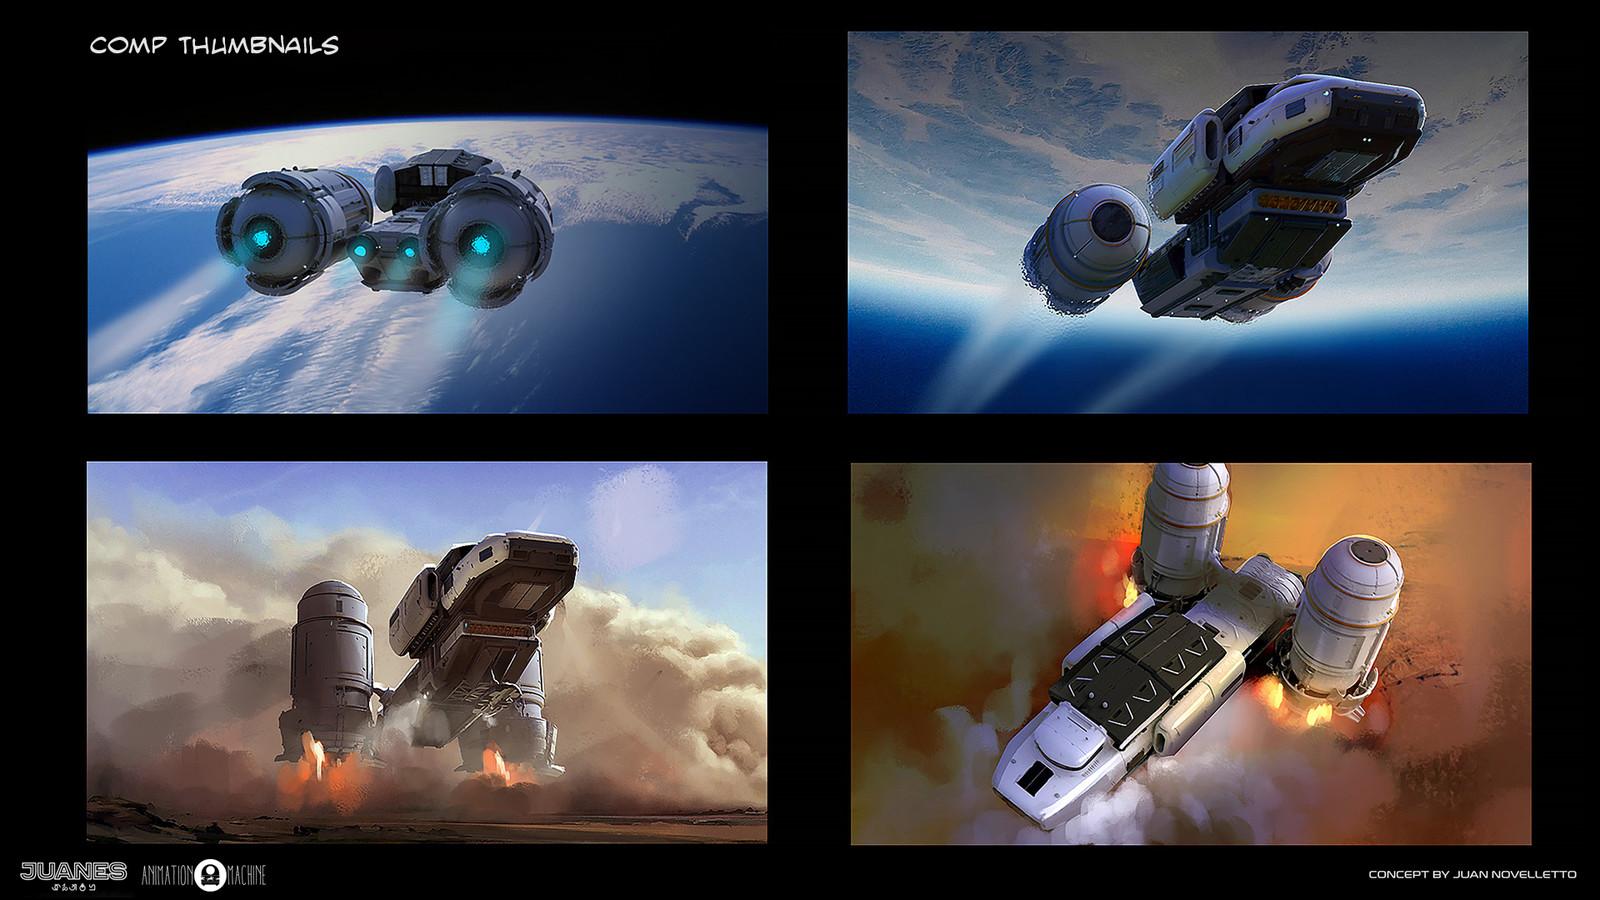 Some composition thumbnails